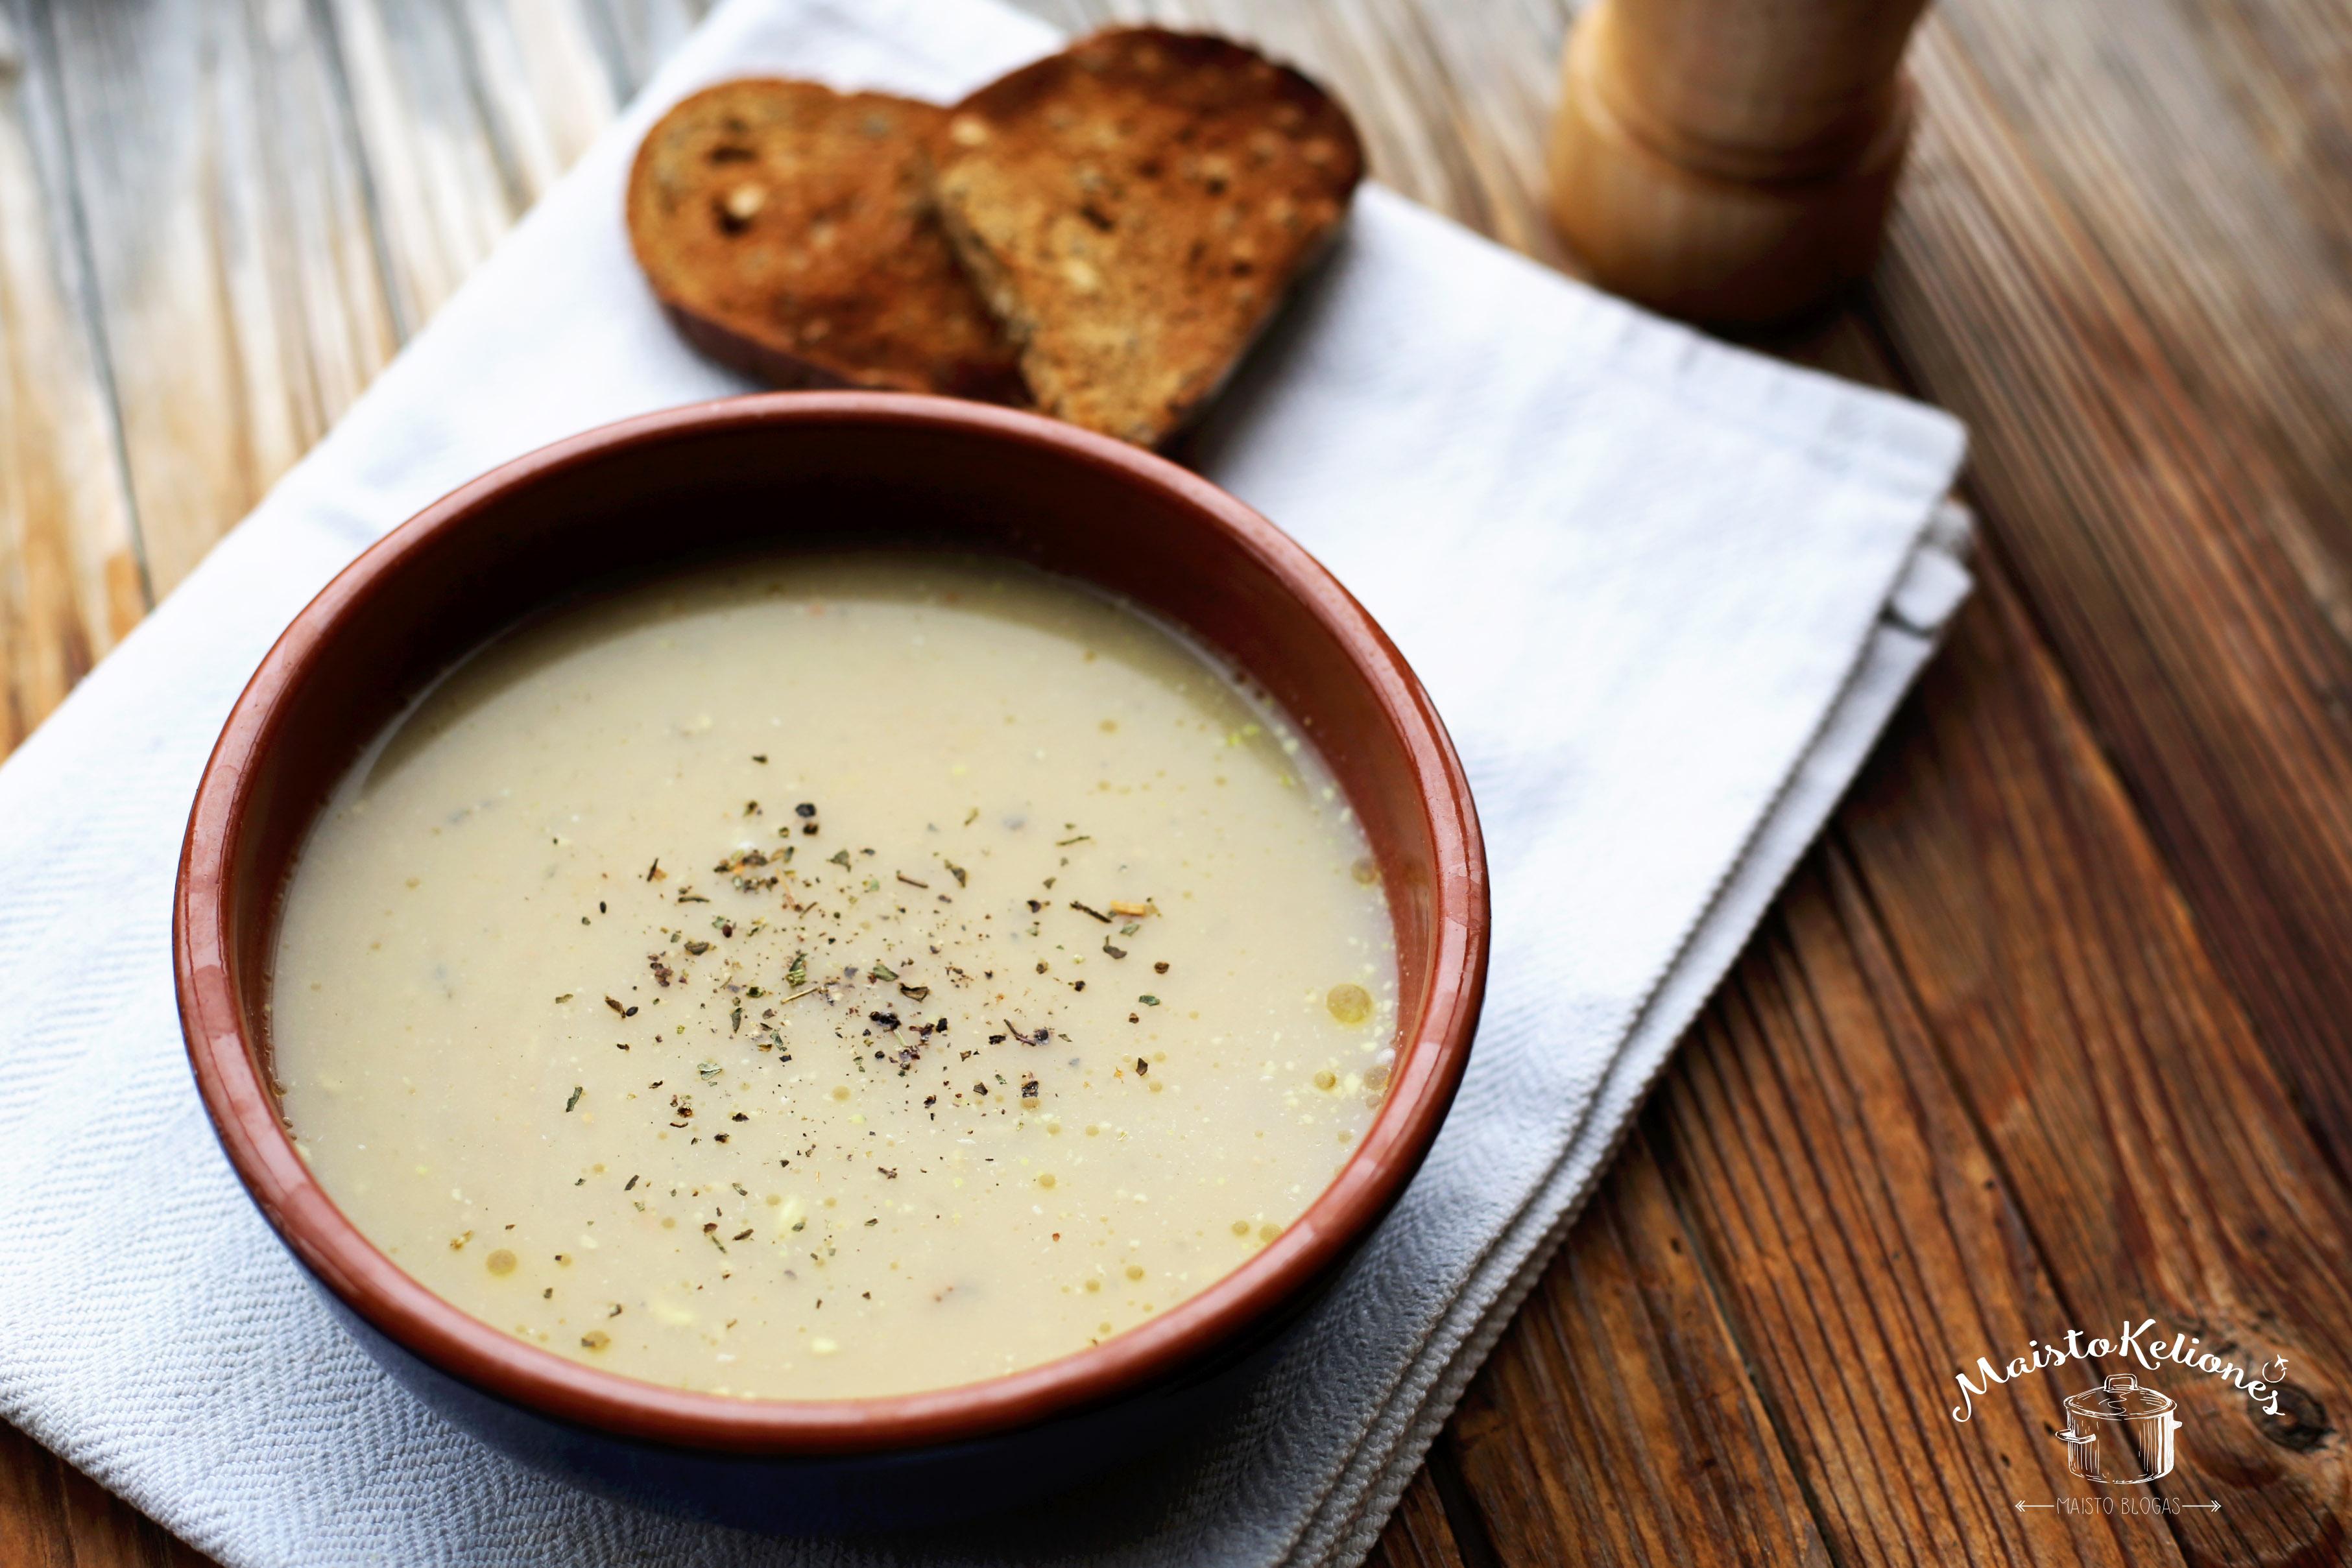 Pupelių sriuba toskaniškai